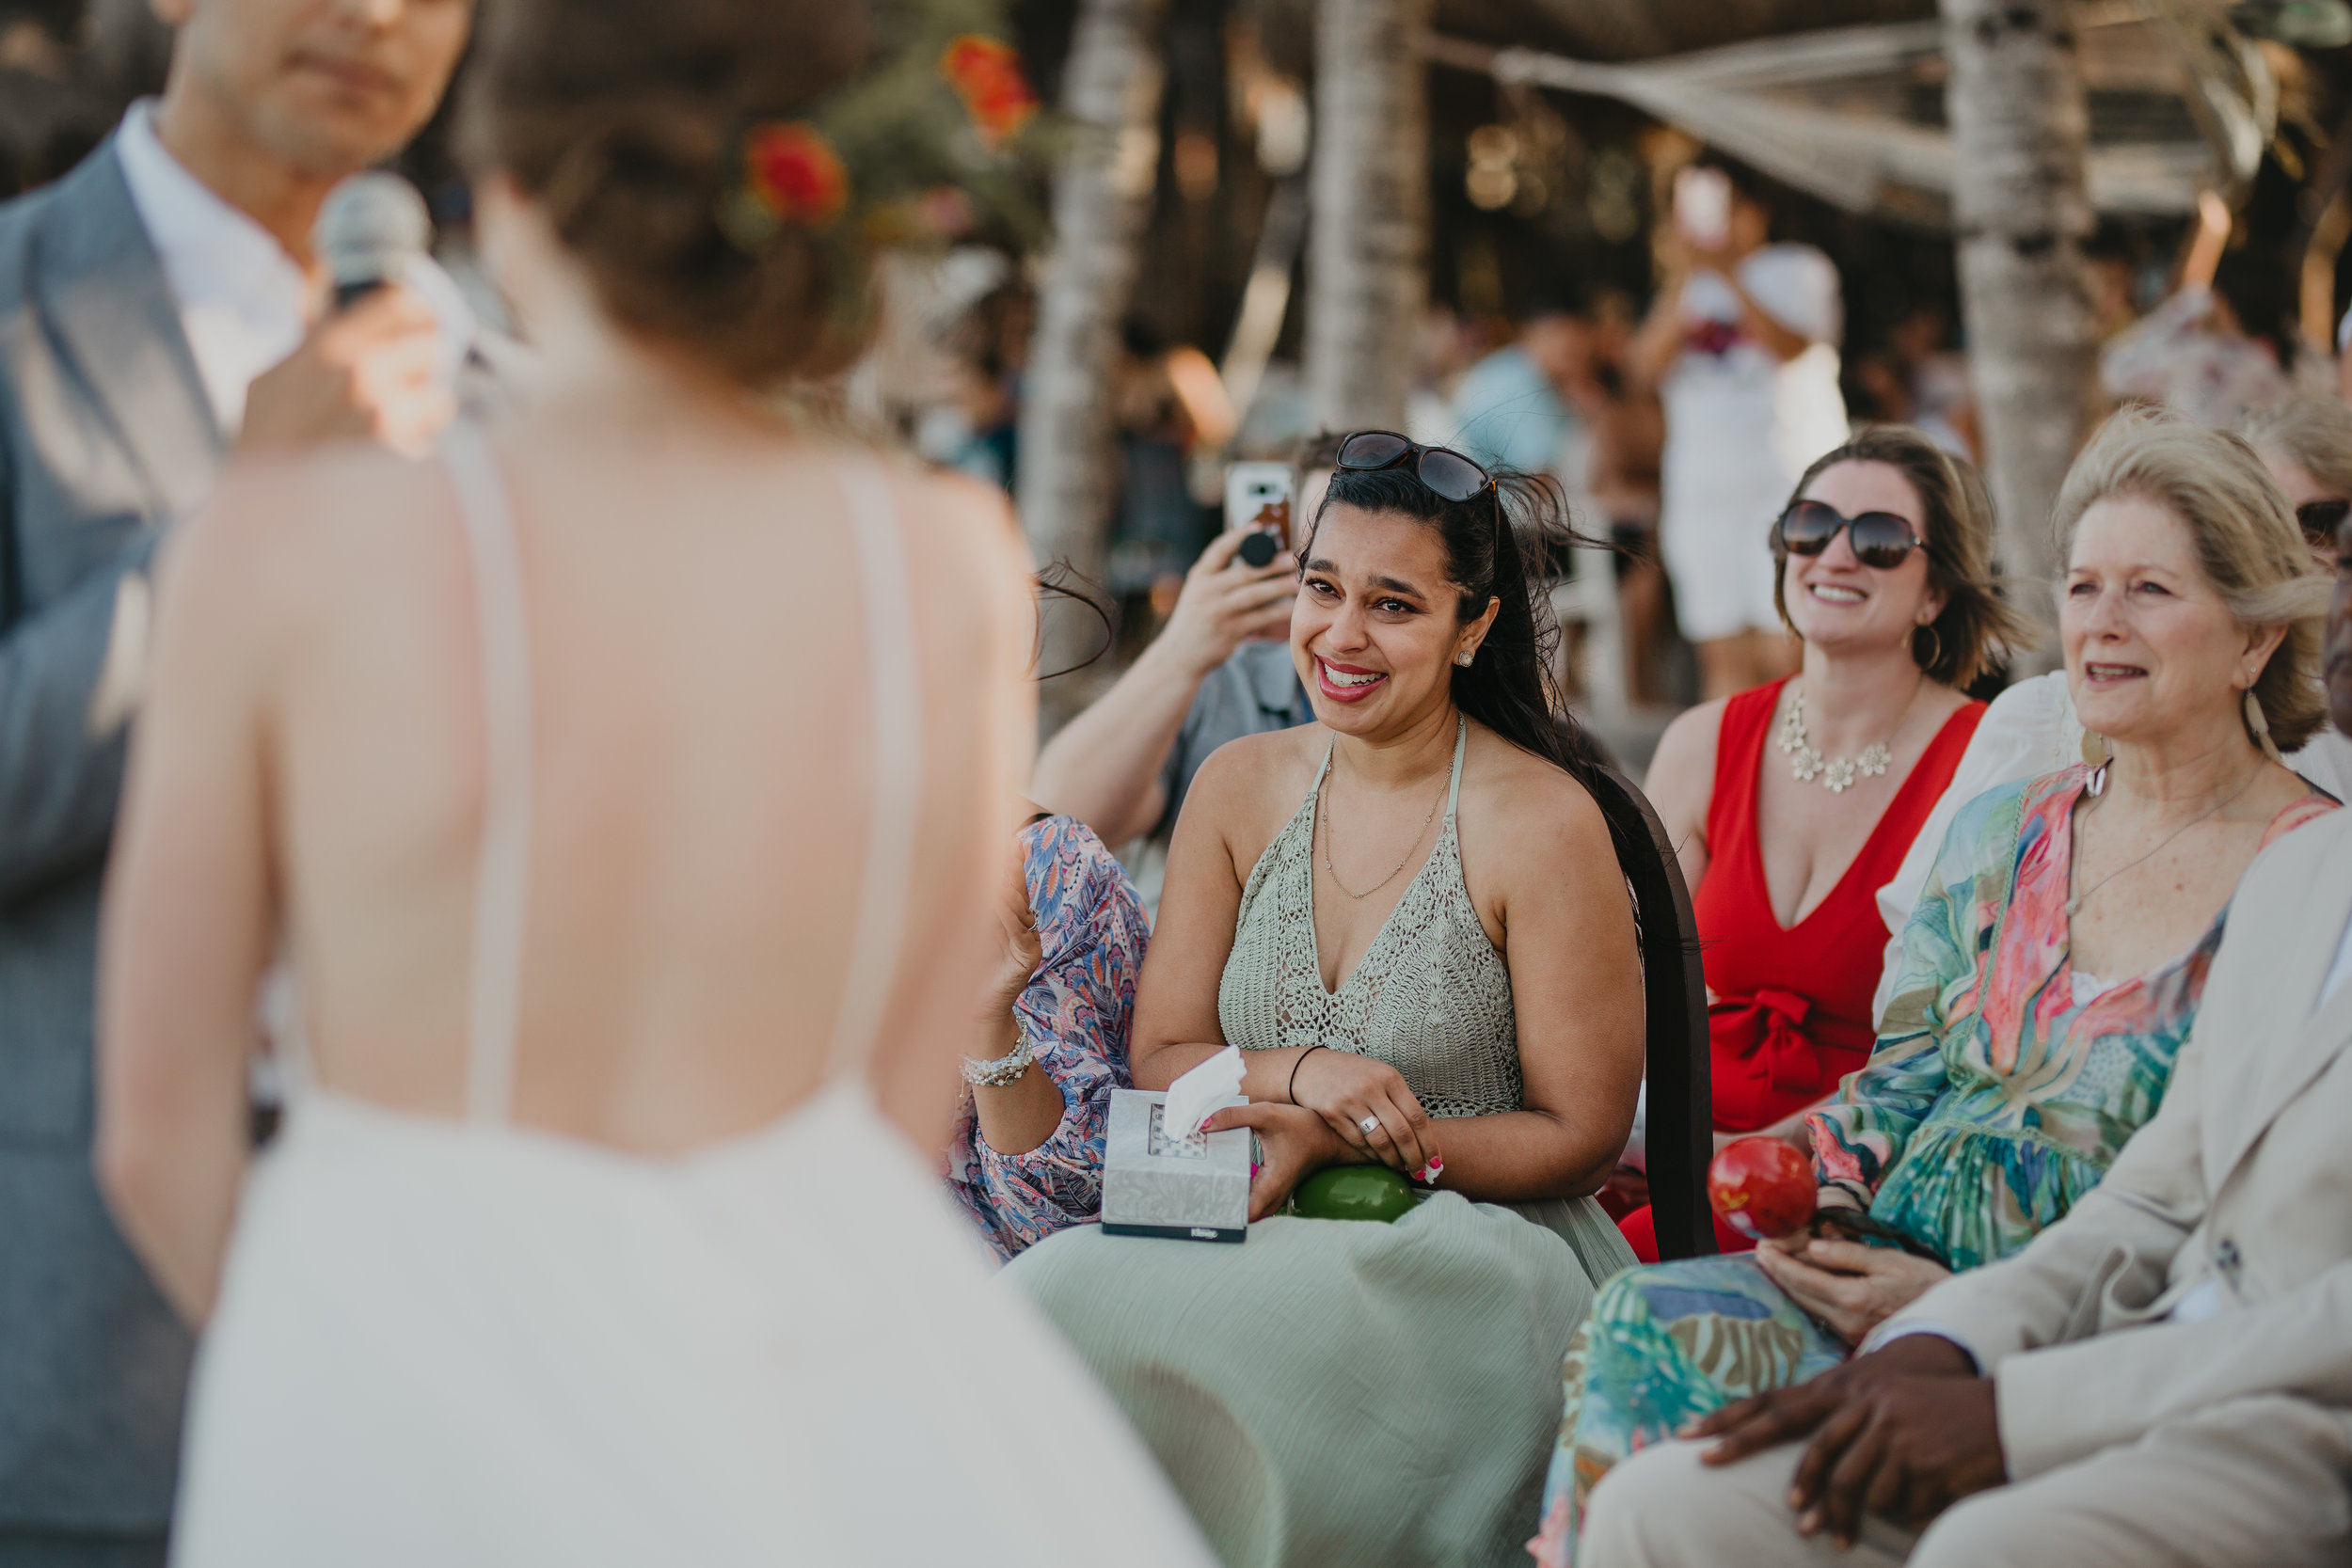 Nicole-Daacke-Photography-beachfront-akumal-destionation-wedding-tulum-mexico-elopement-photographer-destination-wedding-inspiration-sunset-champagne-pop-boho-bride-ocean-tropical-bohemian-tulum-wedding-photos-162.jpg